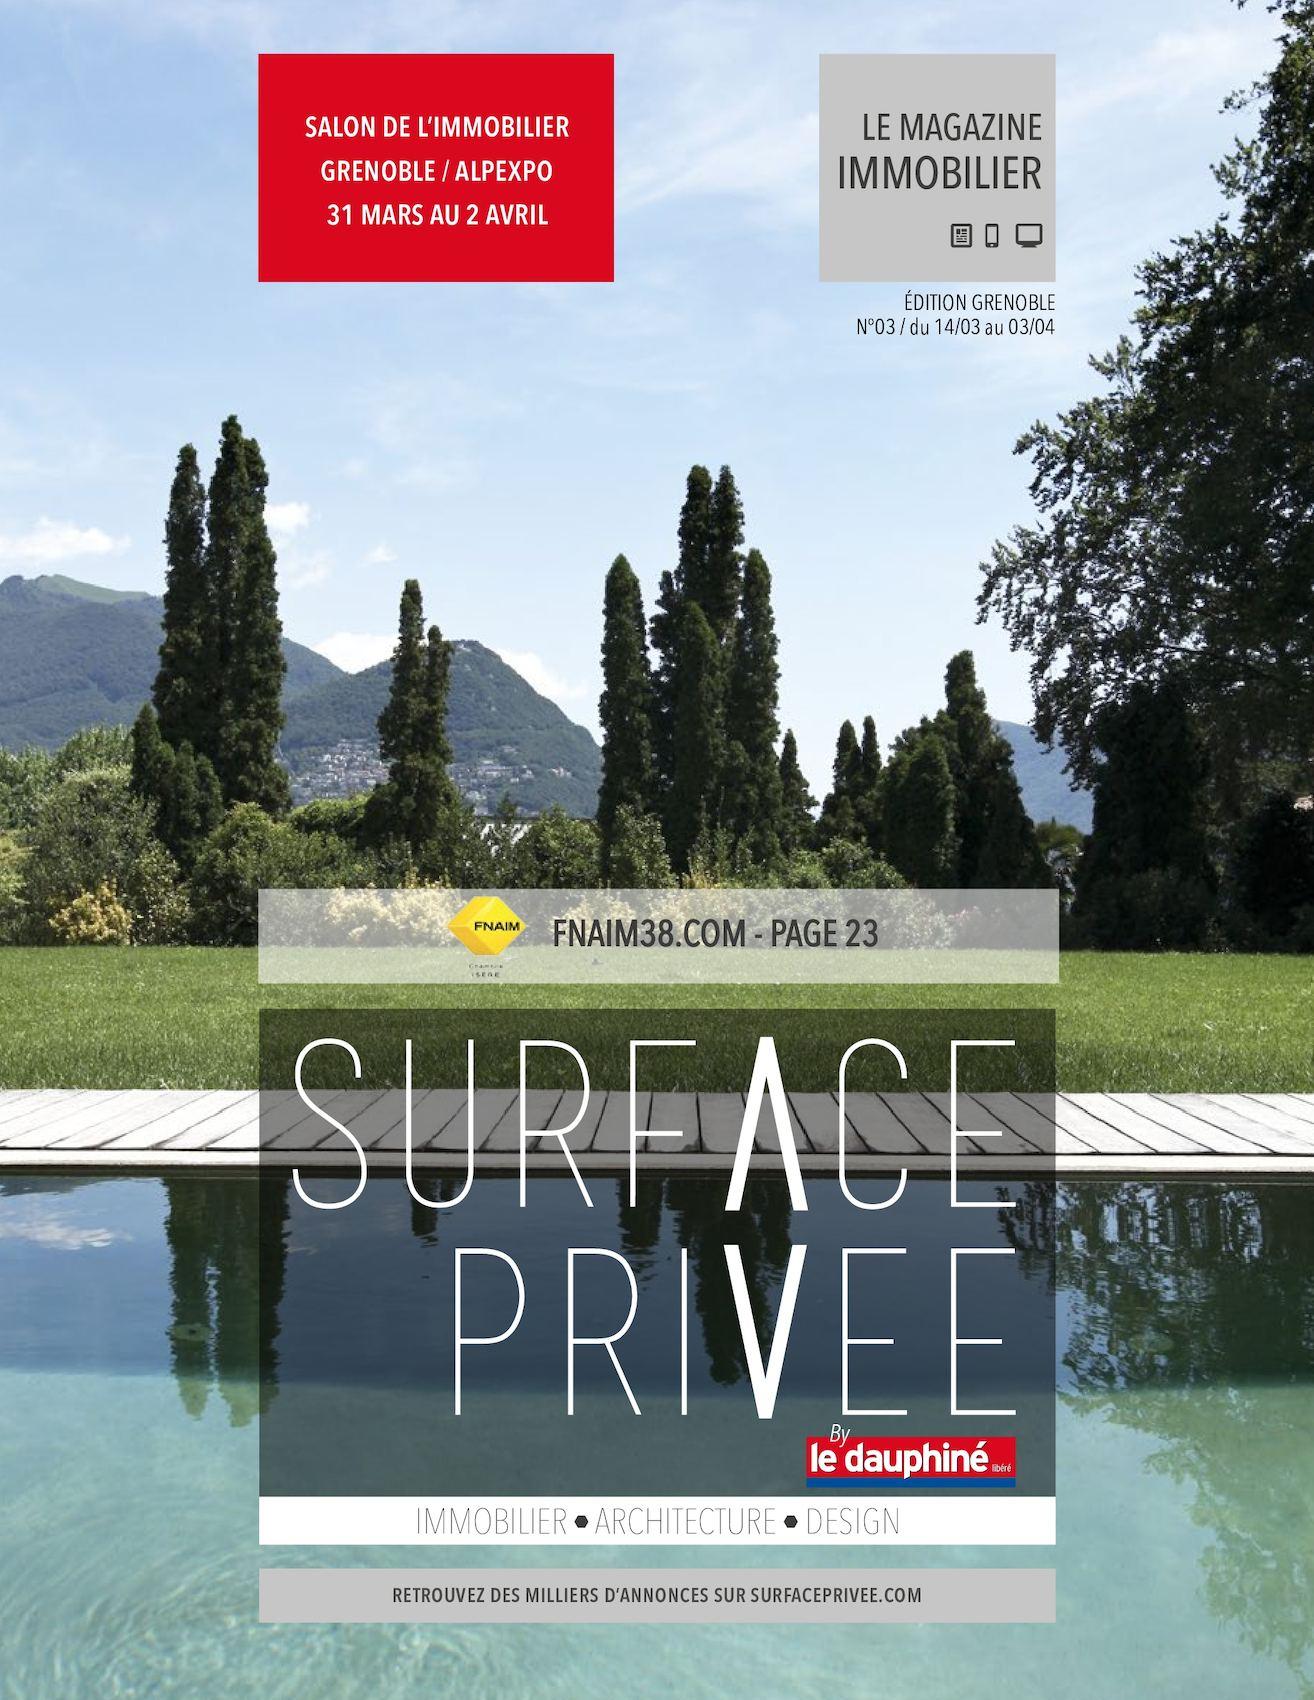 Calaméo - SURFACE PRIVEE GRENOBLE N°03 9499826835cc